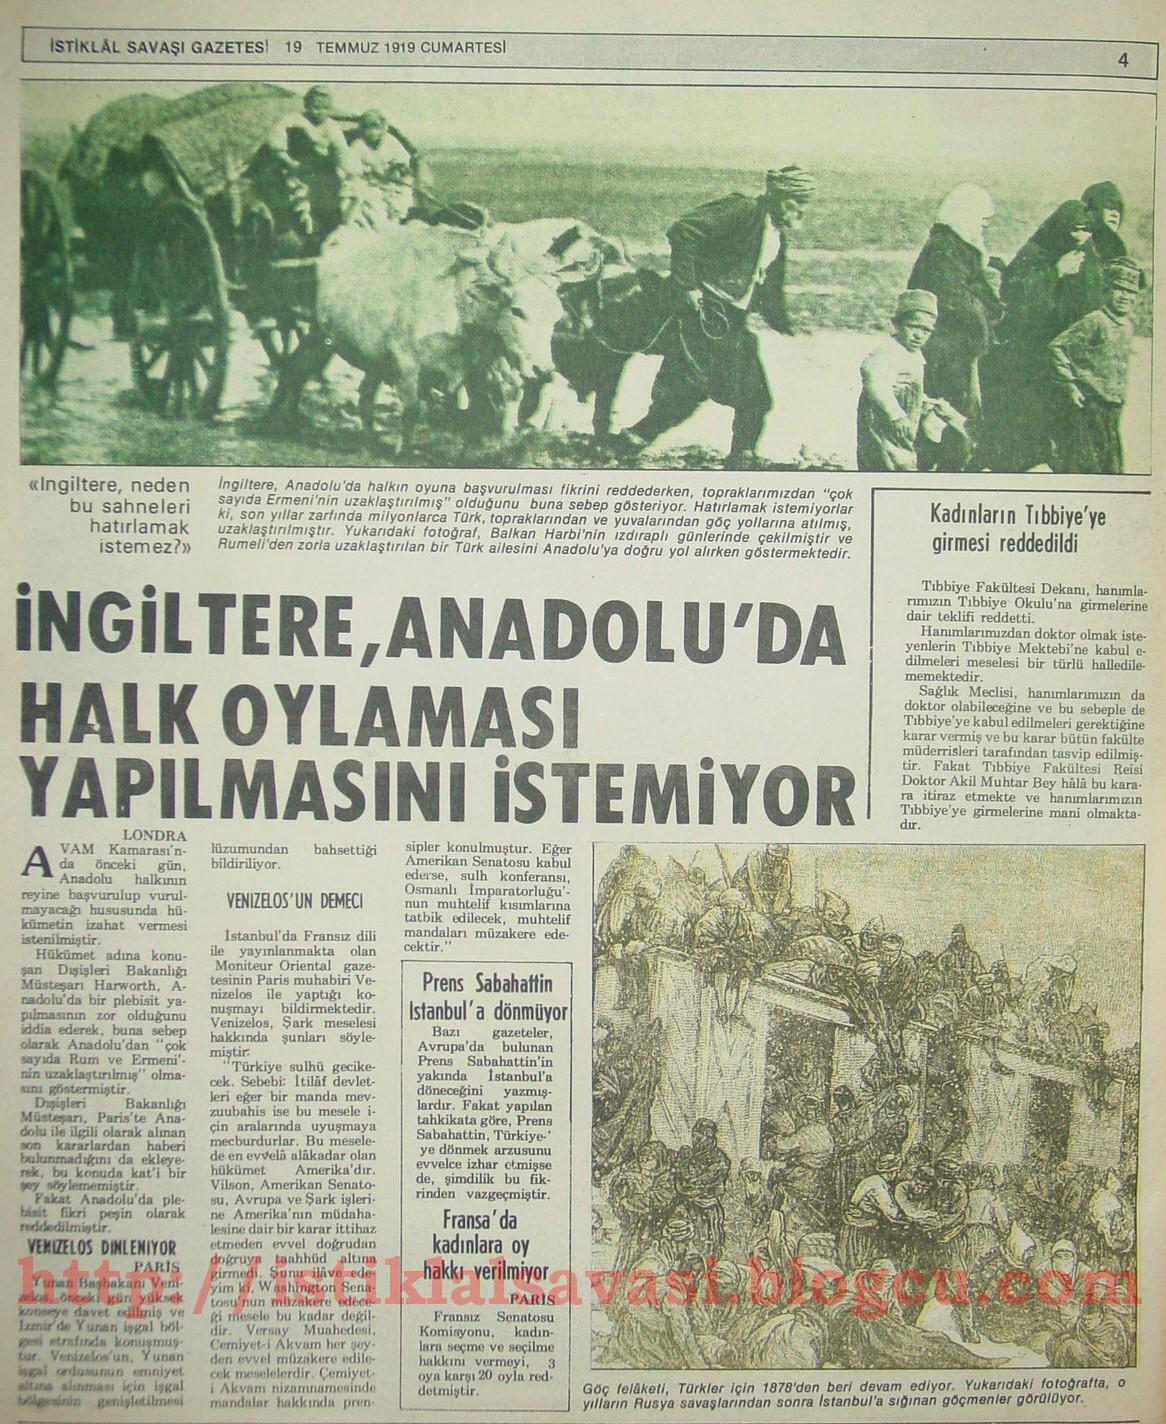 İstiklal Savaşı gazetesi